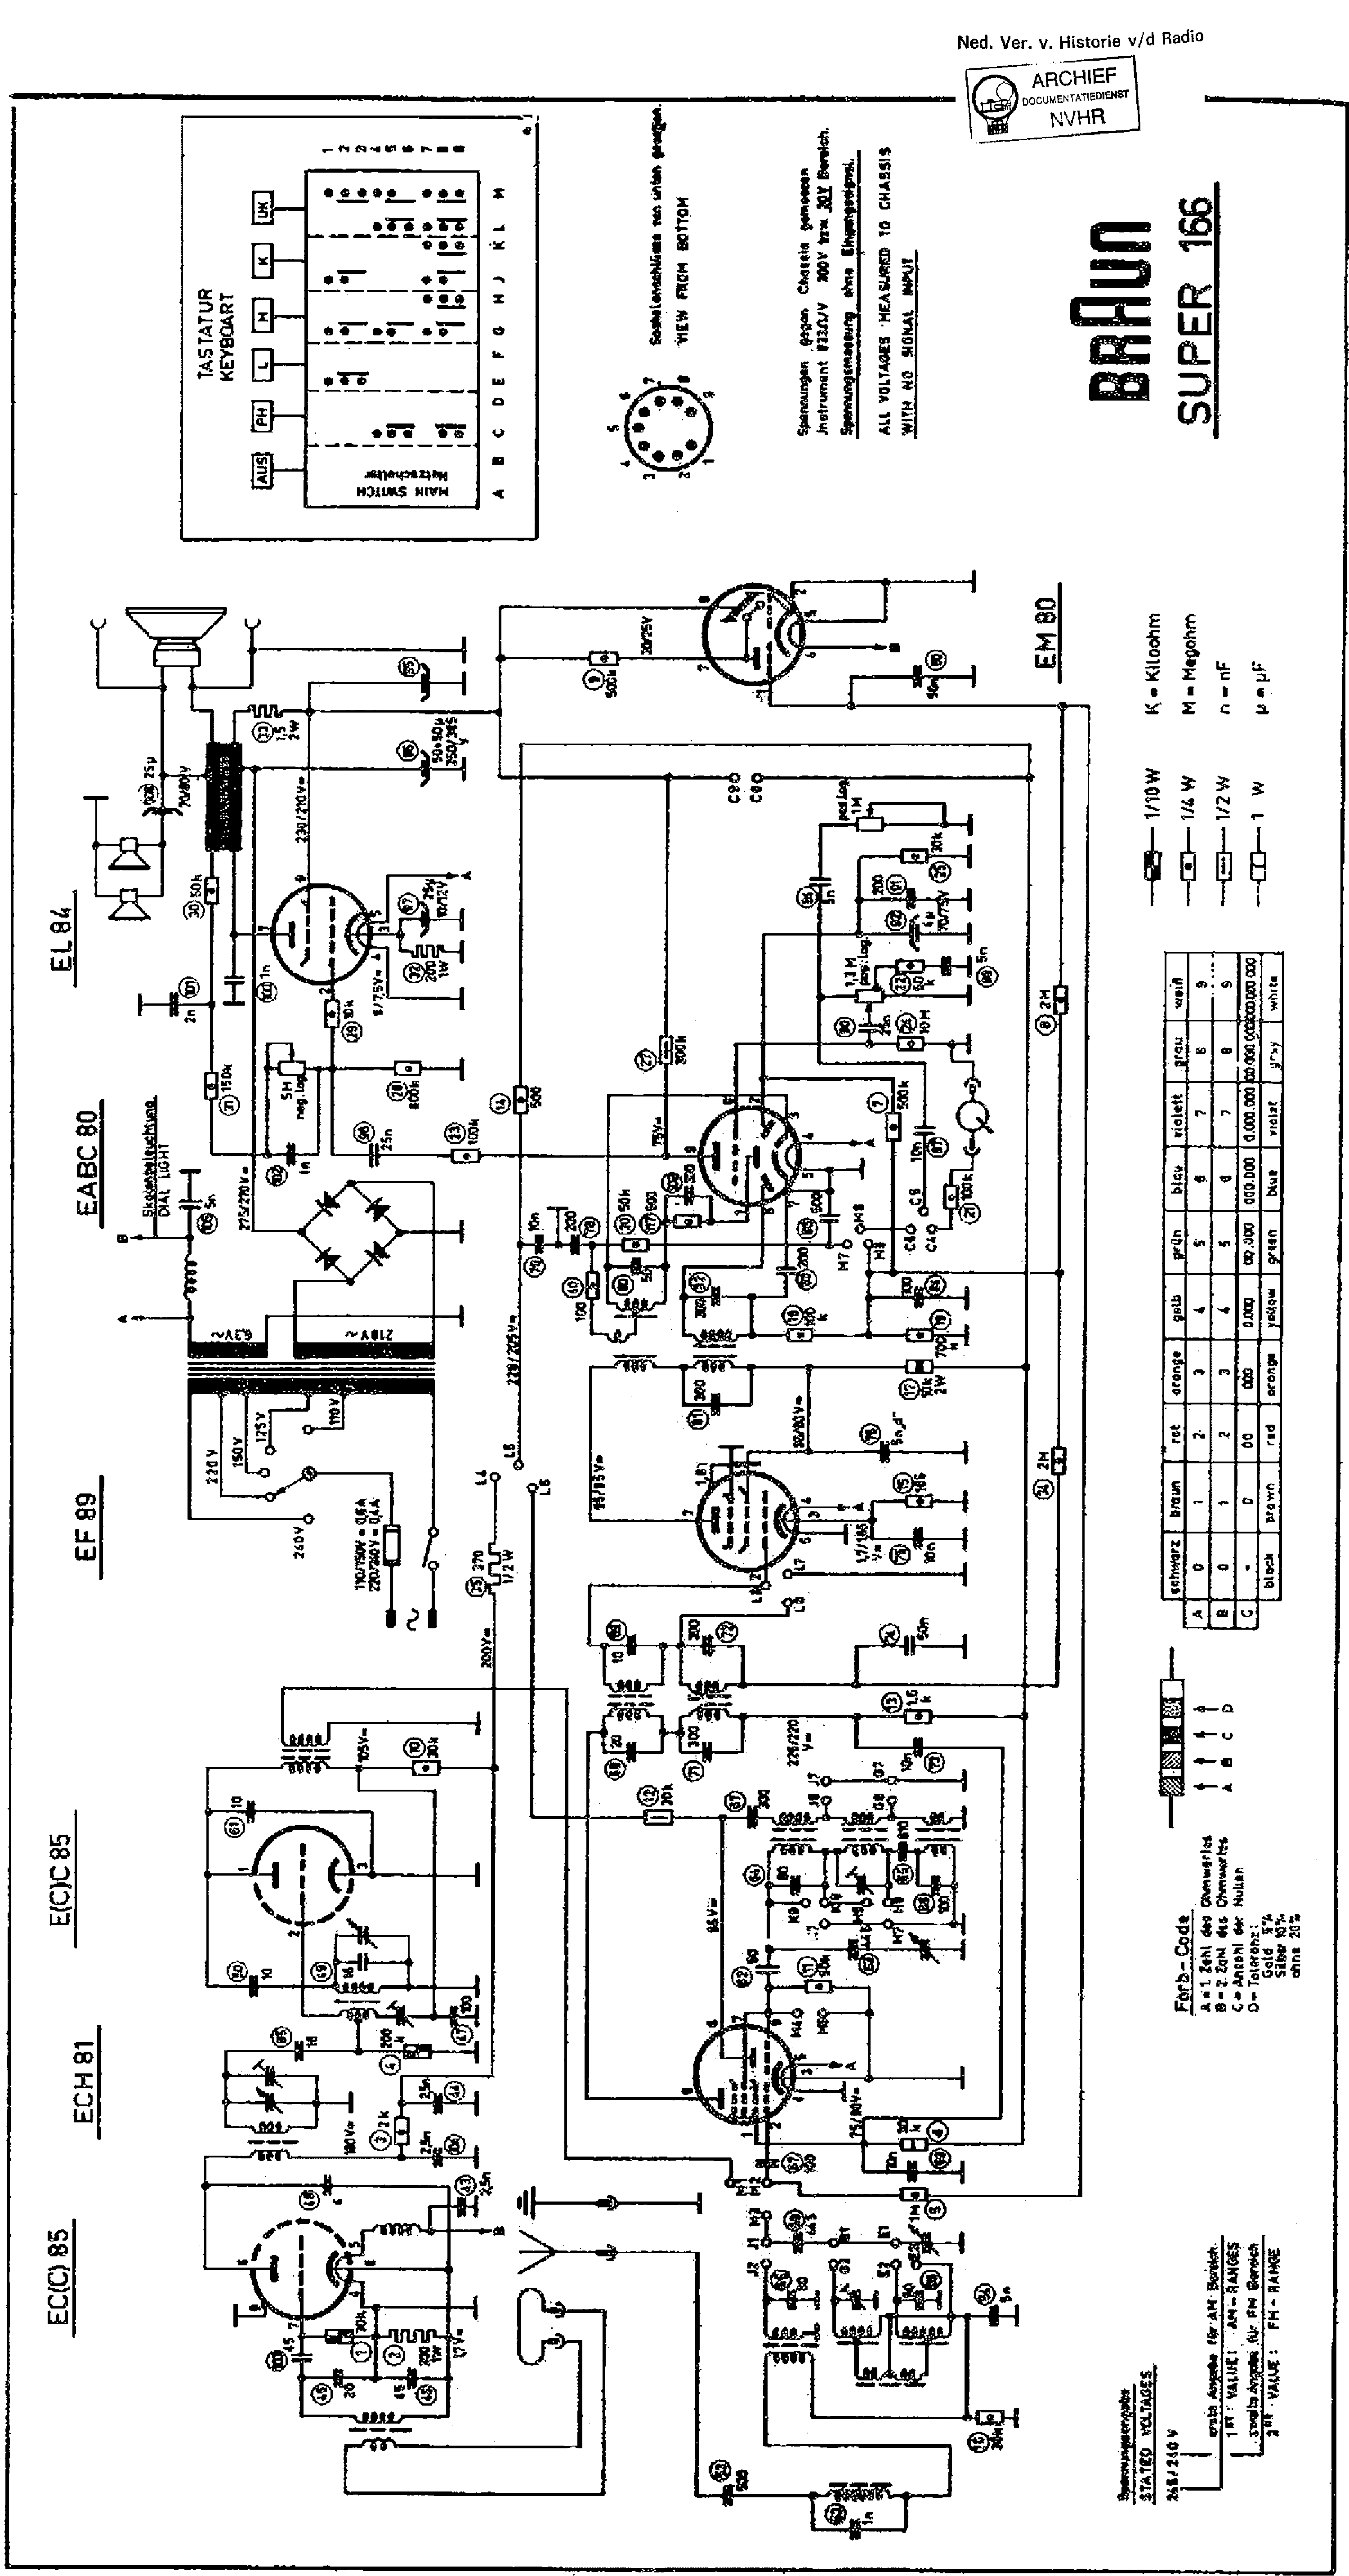 Braun Super 166 Am Fm Receiver Sch Service Manual Download Circuit 1st Page